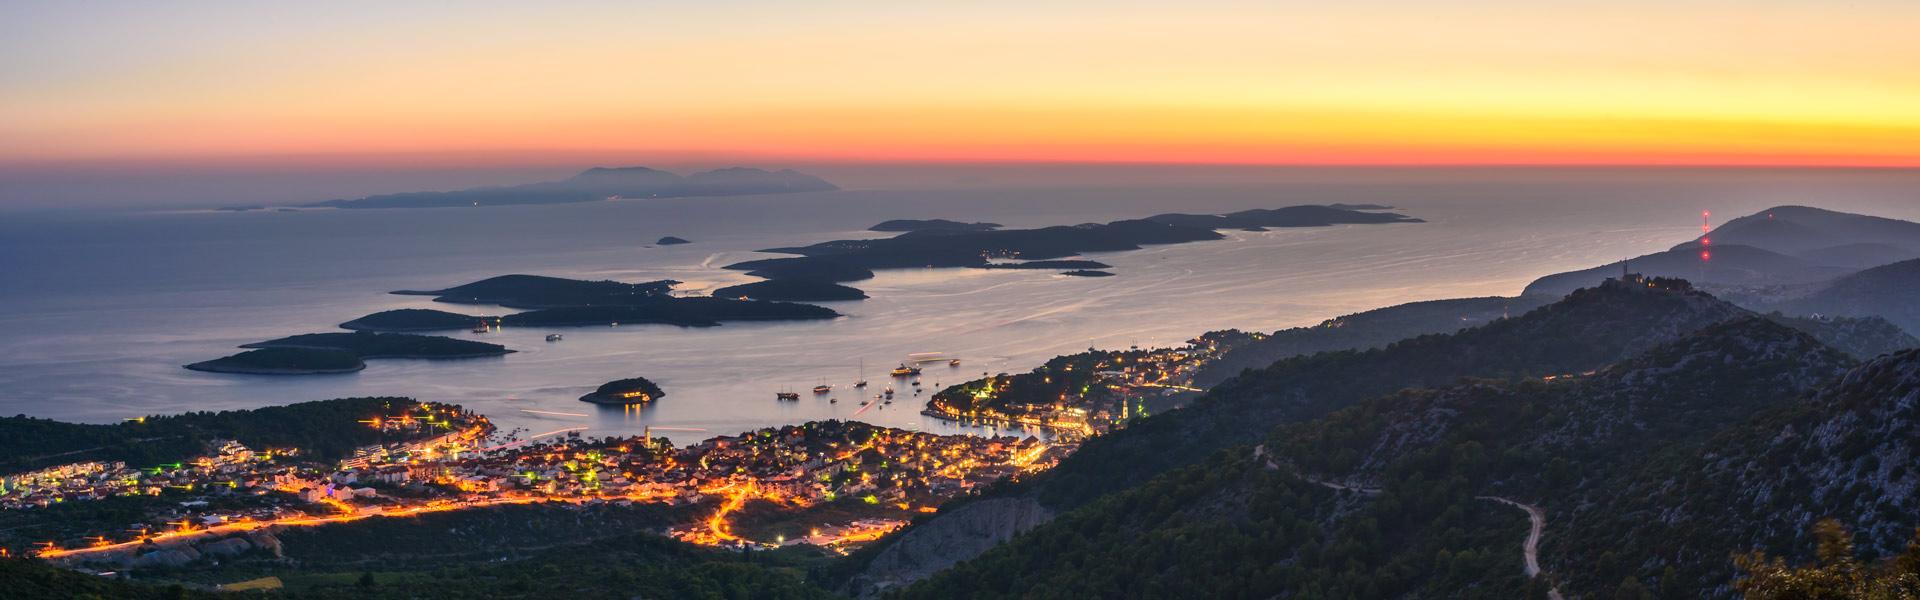 Dive Center Hvar Croatia